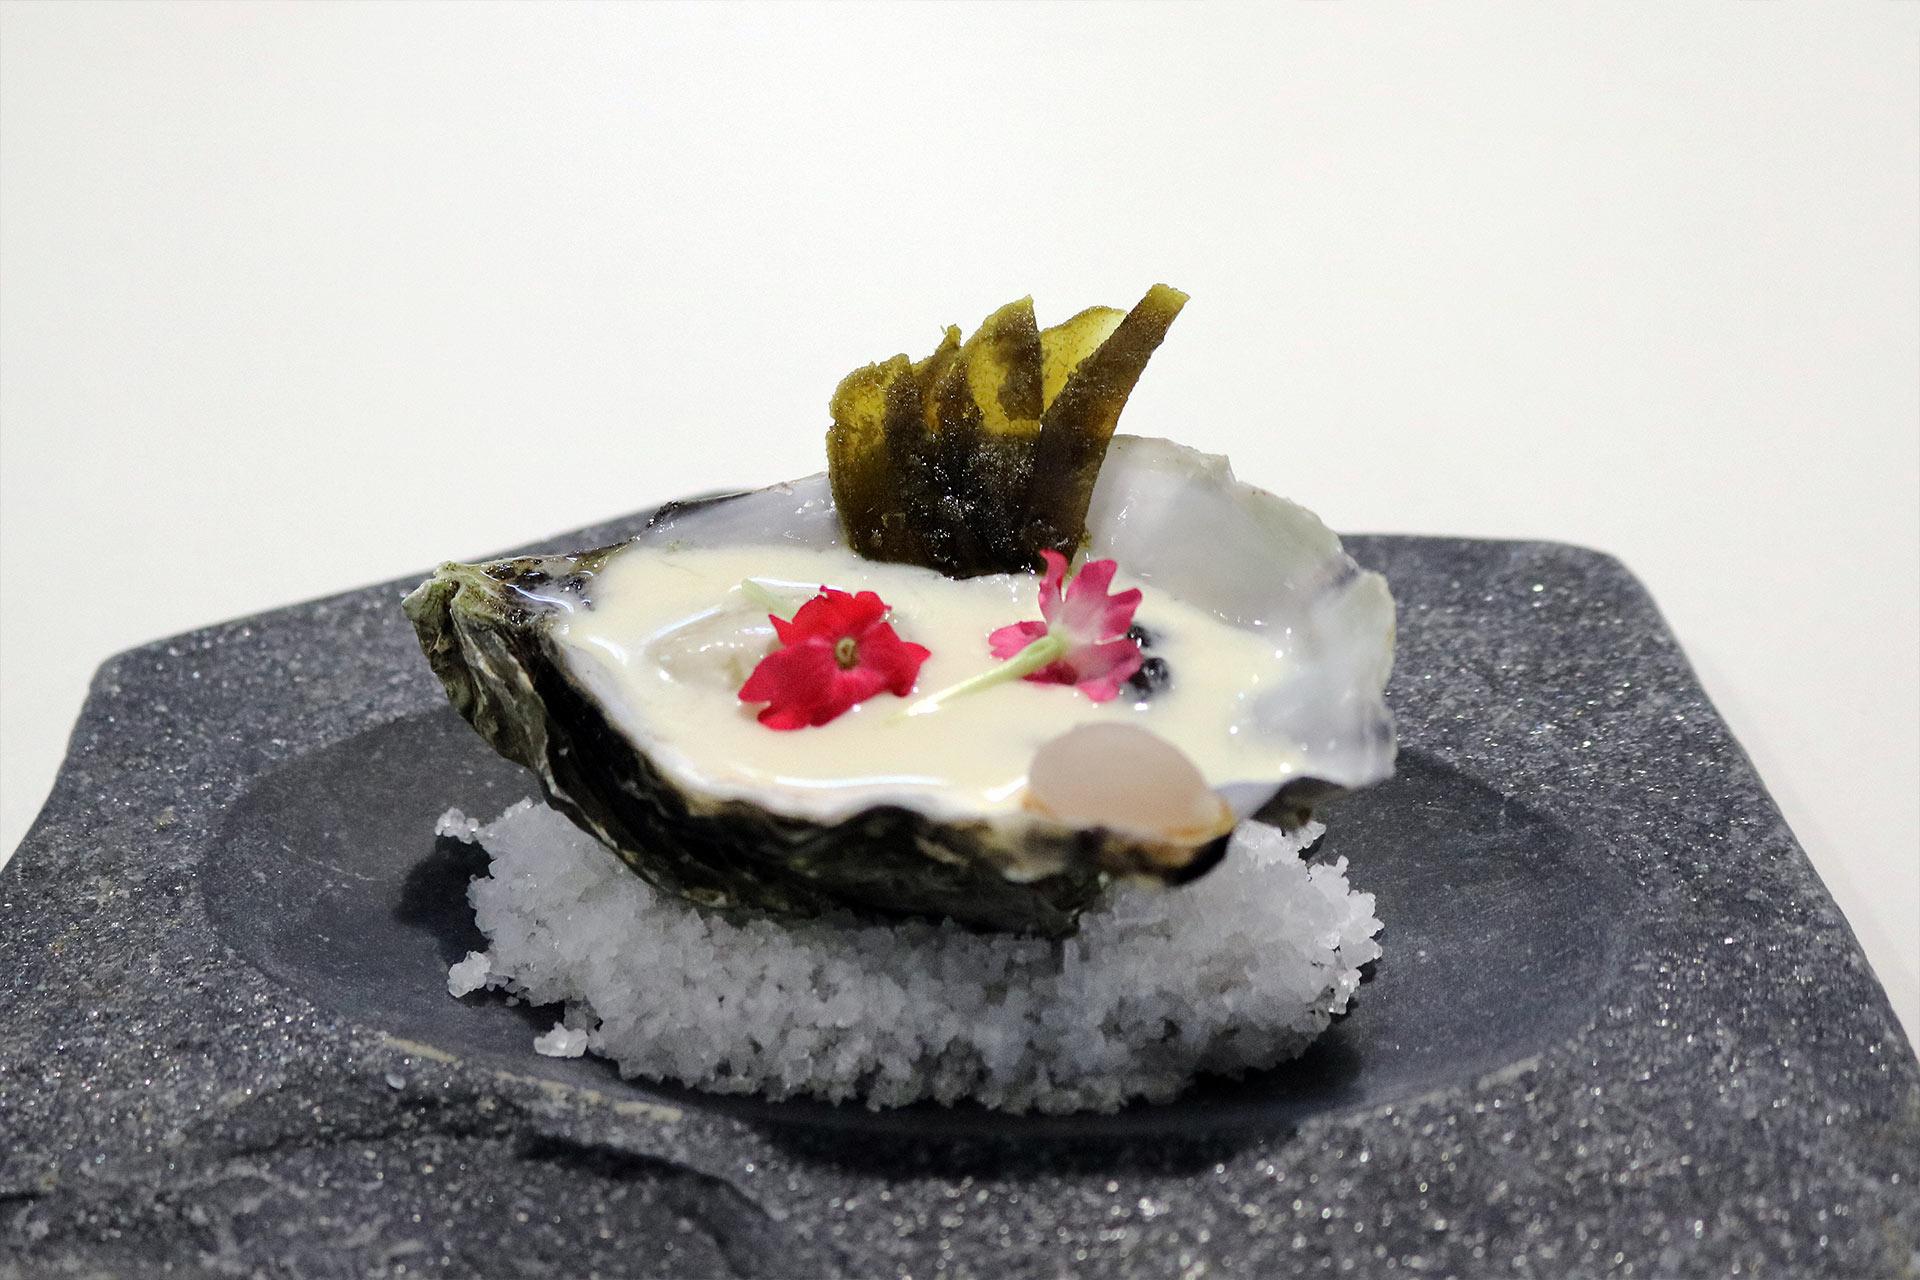 Plato de tecnica gastronómica